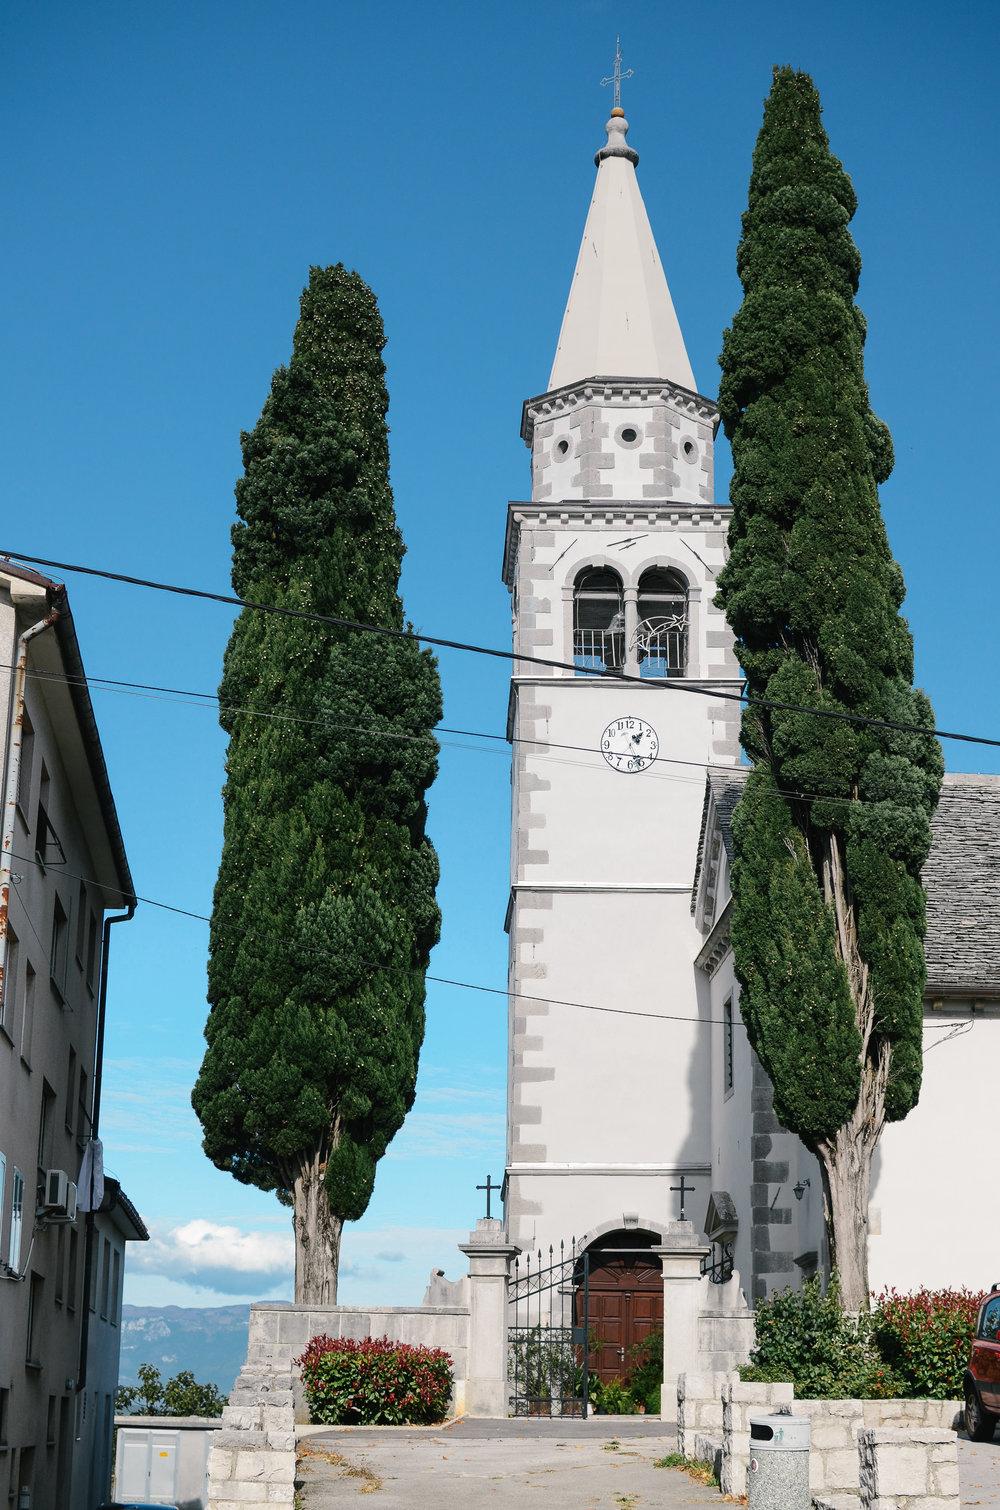 day-trips-western-slovenia-lifeonpine_DSC_0957.jpg